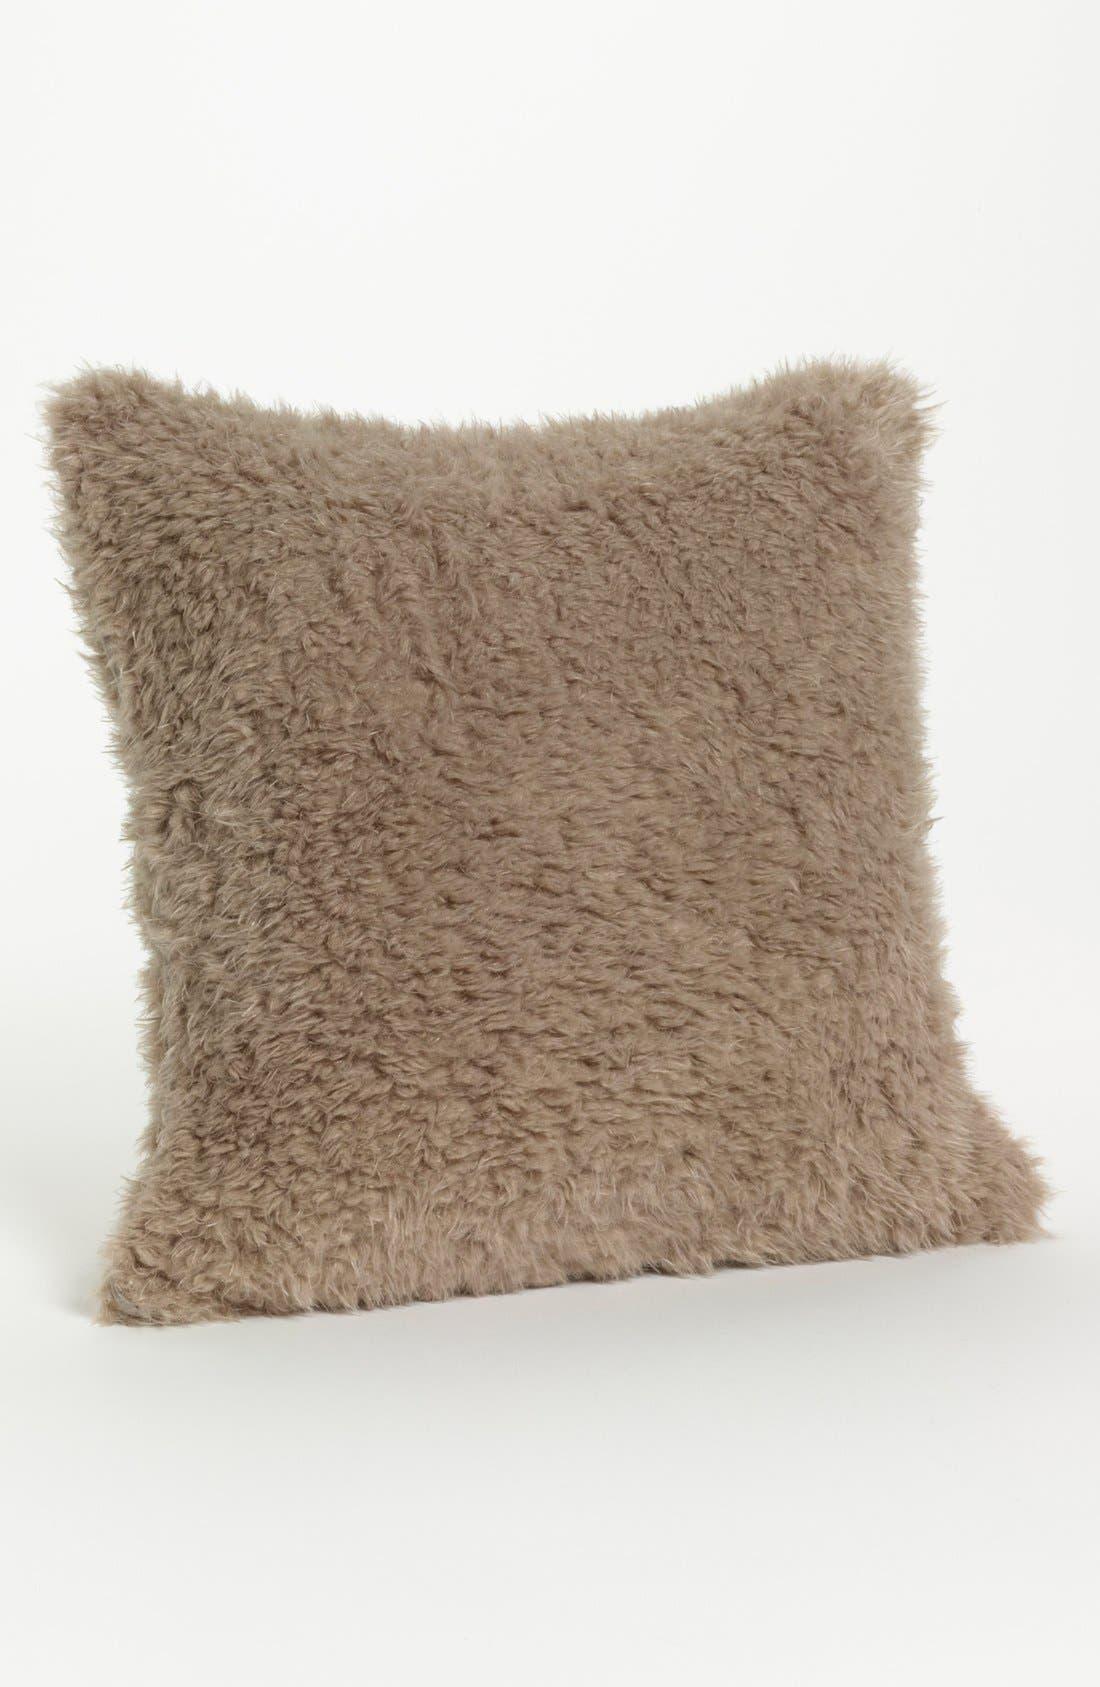 Main Image - Giraffe at Home 'Bella' Throw Pillow